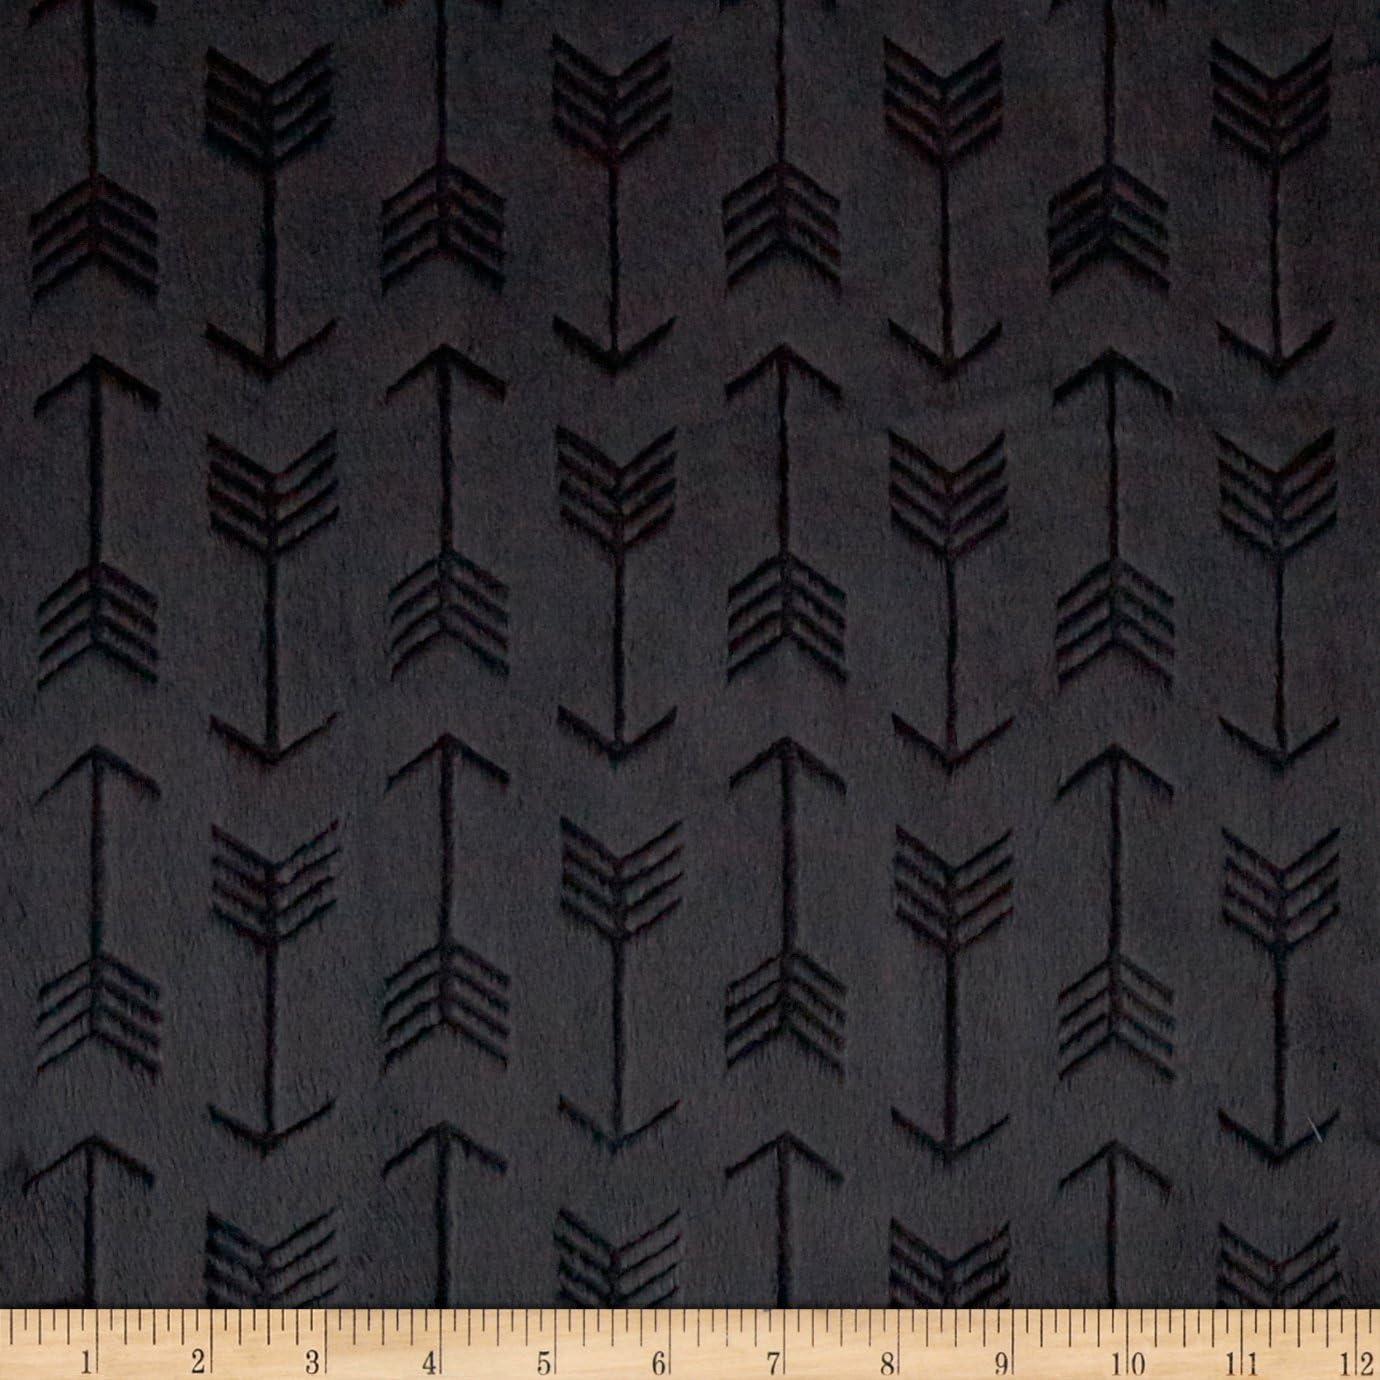 MINKY Premier Favo in Ivory /& Black Cuddle Minky from Shannon Fabrics